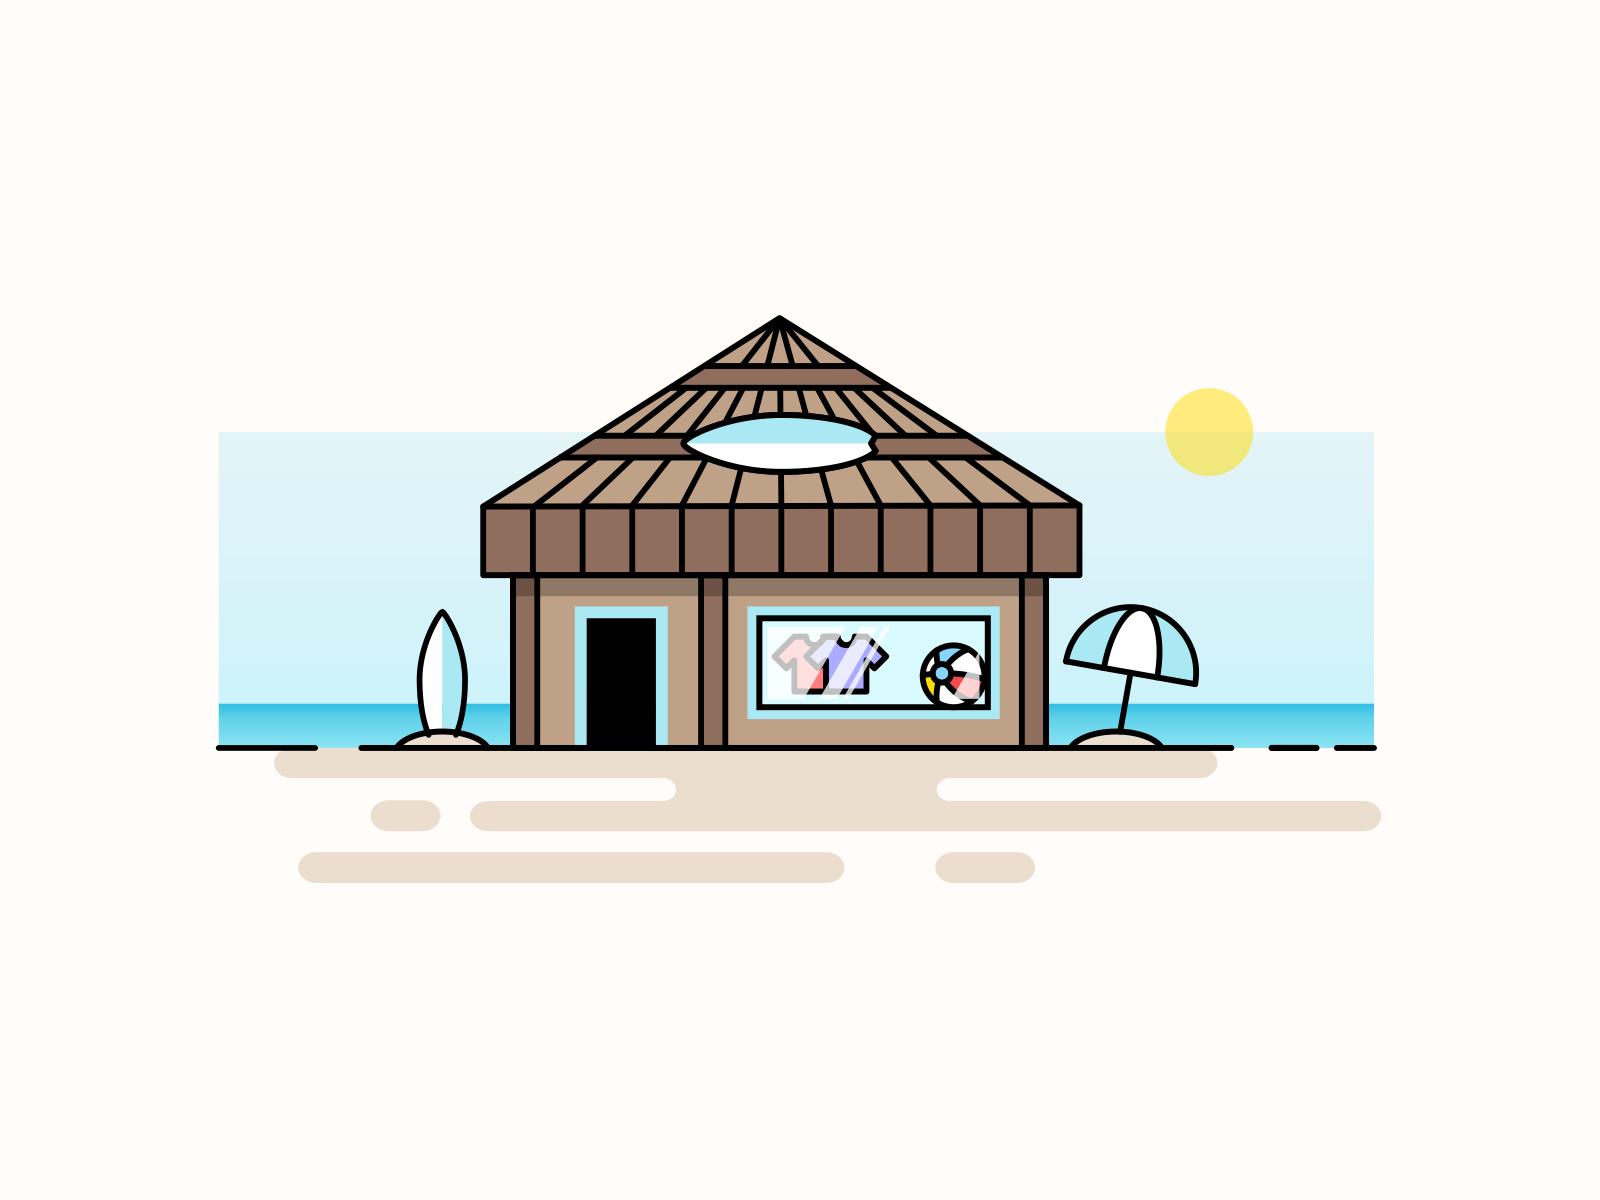 Beach Shop storefront season logo hut sand icon illustration shopping art line store umbrella water ocean surfing surf summer sun shop beach